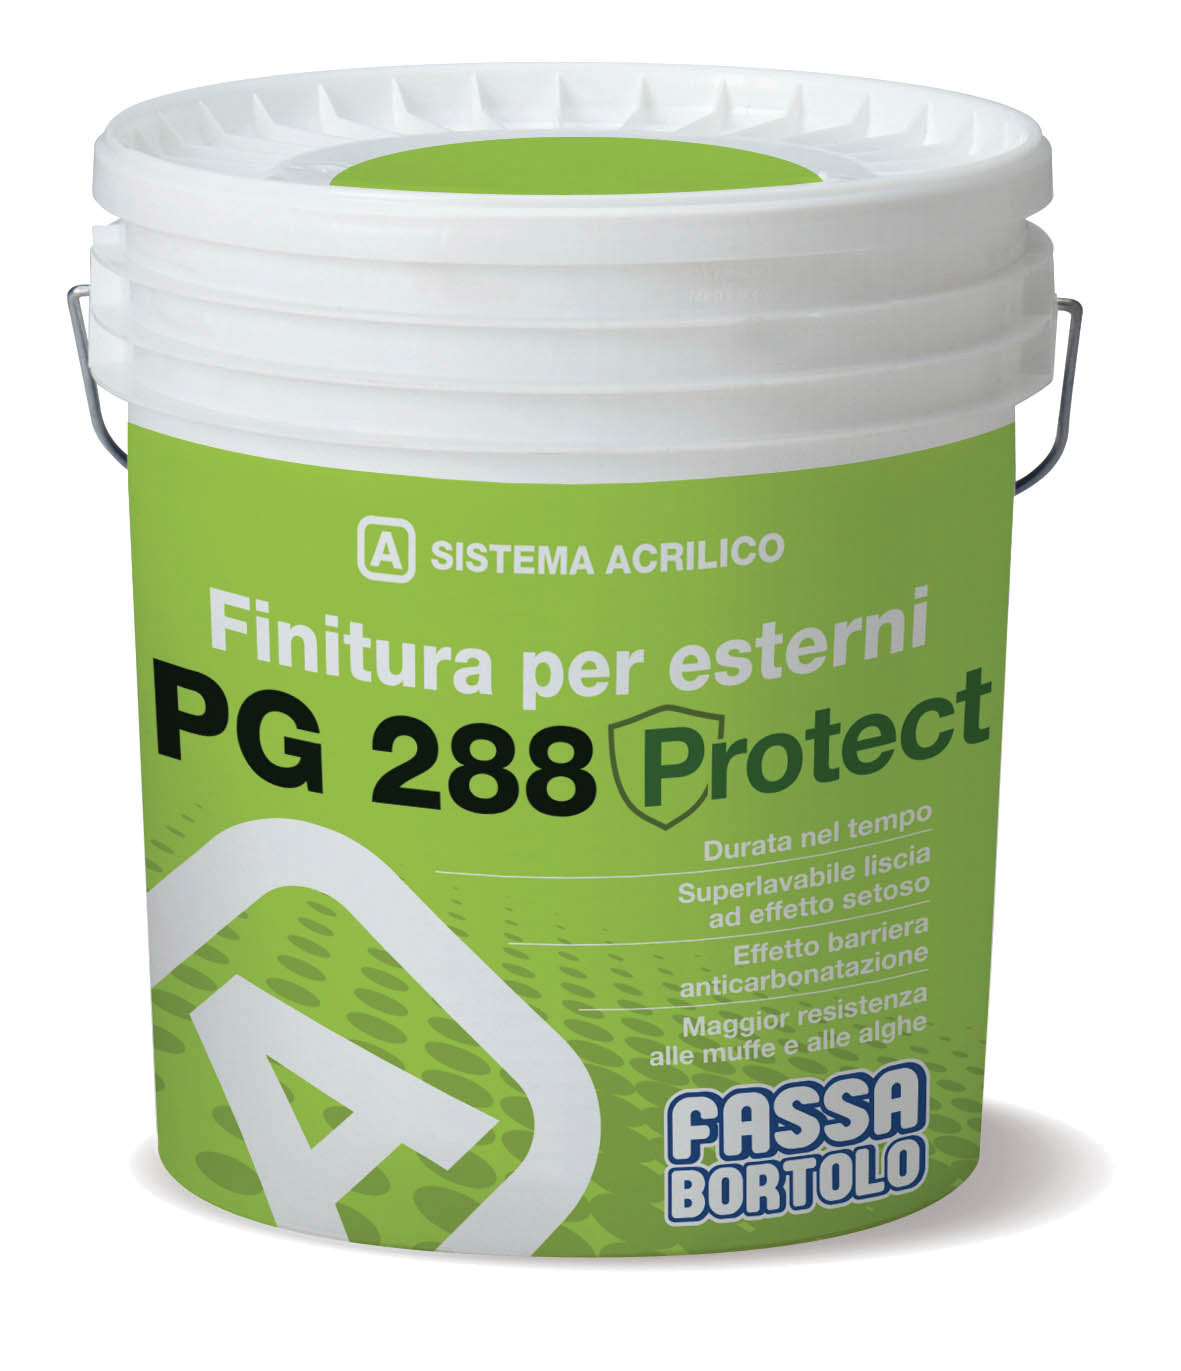 PG 288 PROTECT: Finitura liscia opaca per esterni